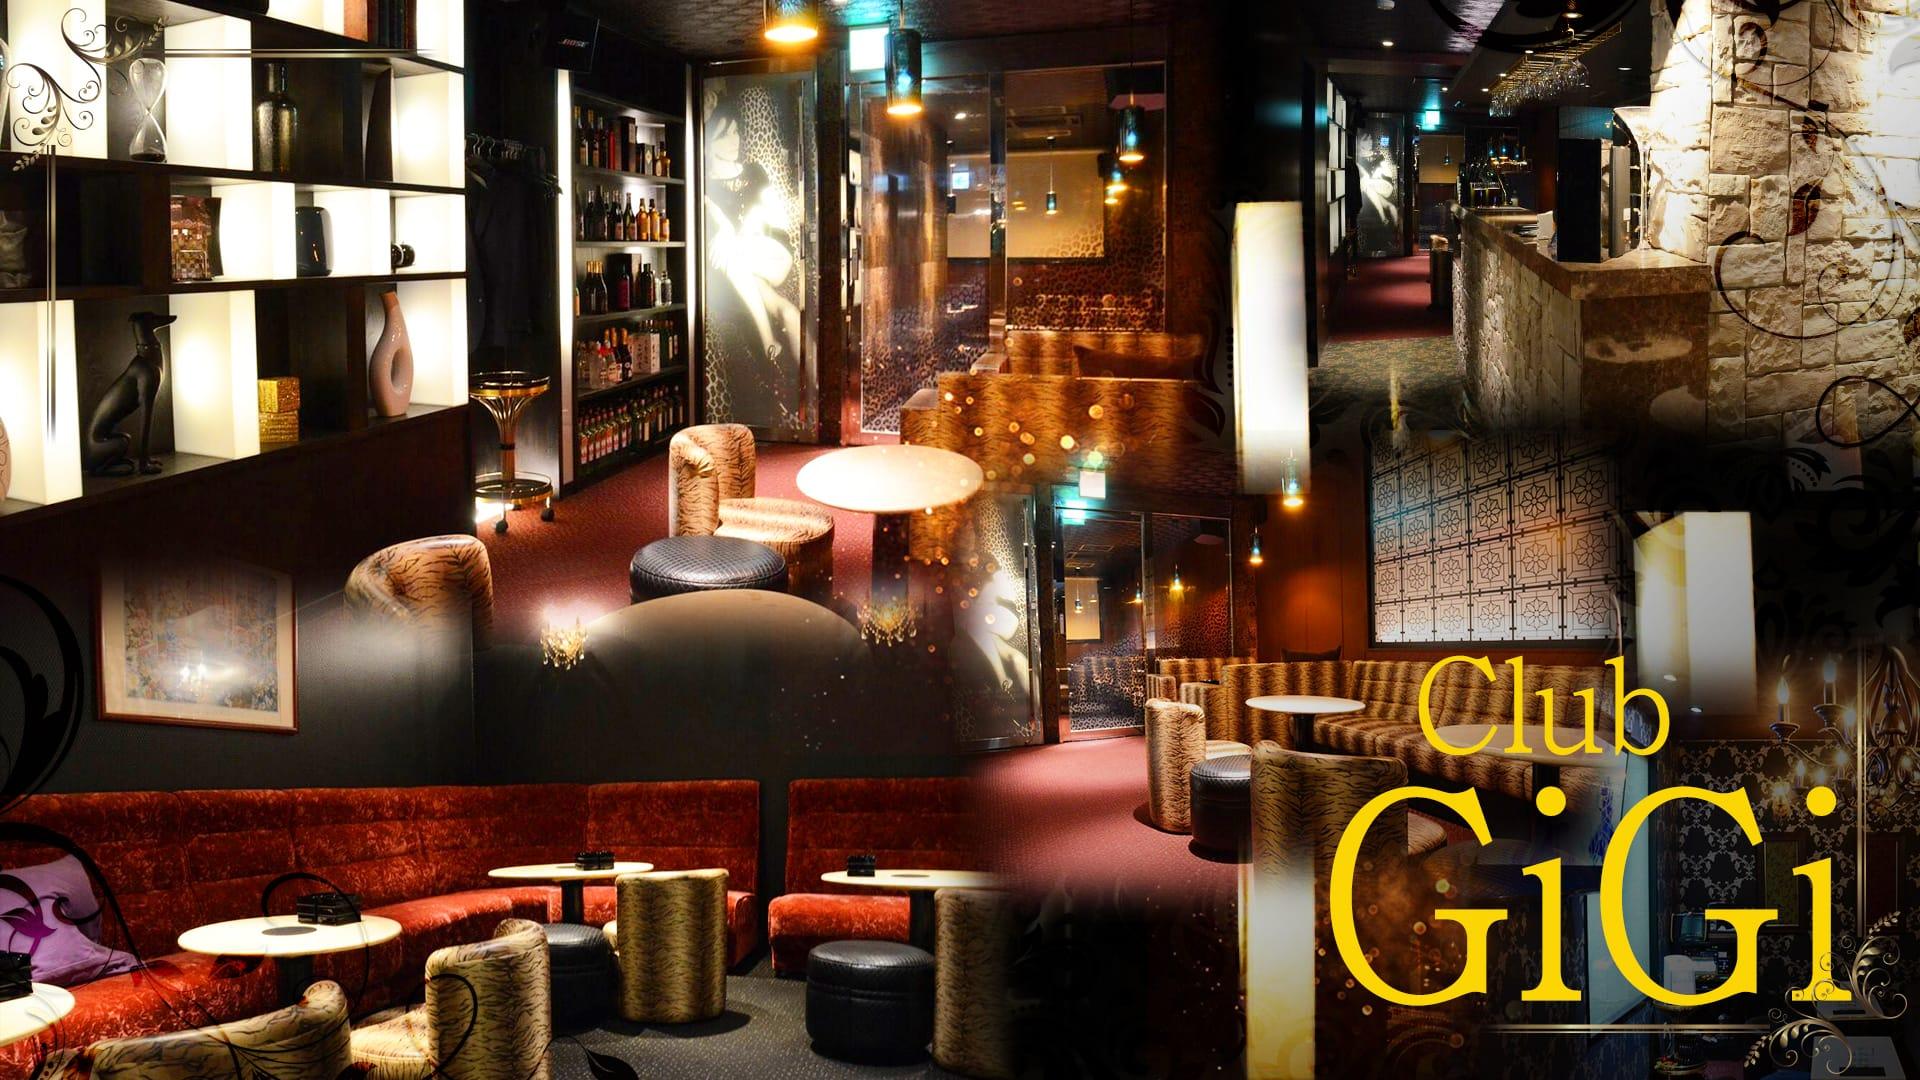 Club GiGi (クラブ ジジ) 藤枝キャバクラ TOP画像